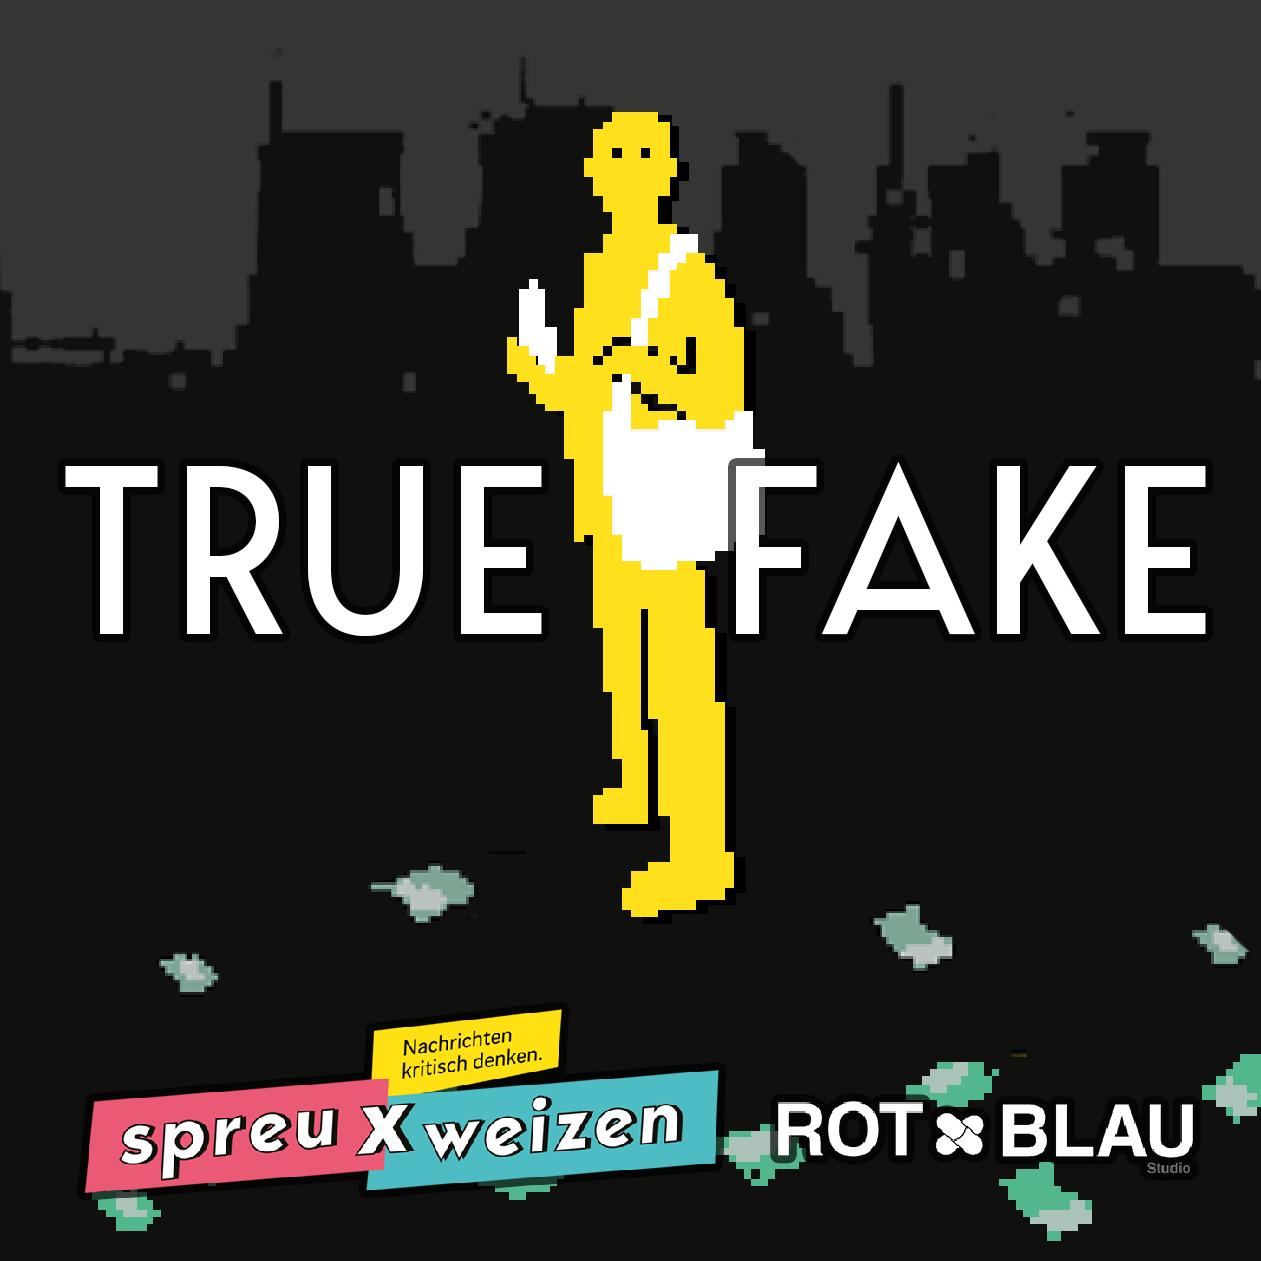 TrueFake_Portfolio_Image